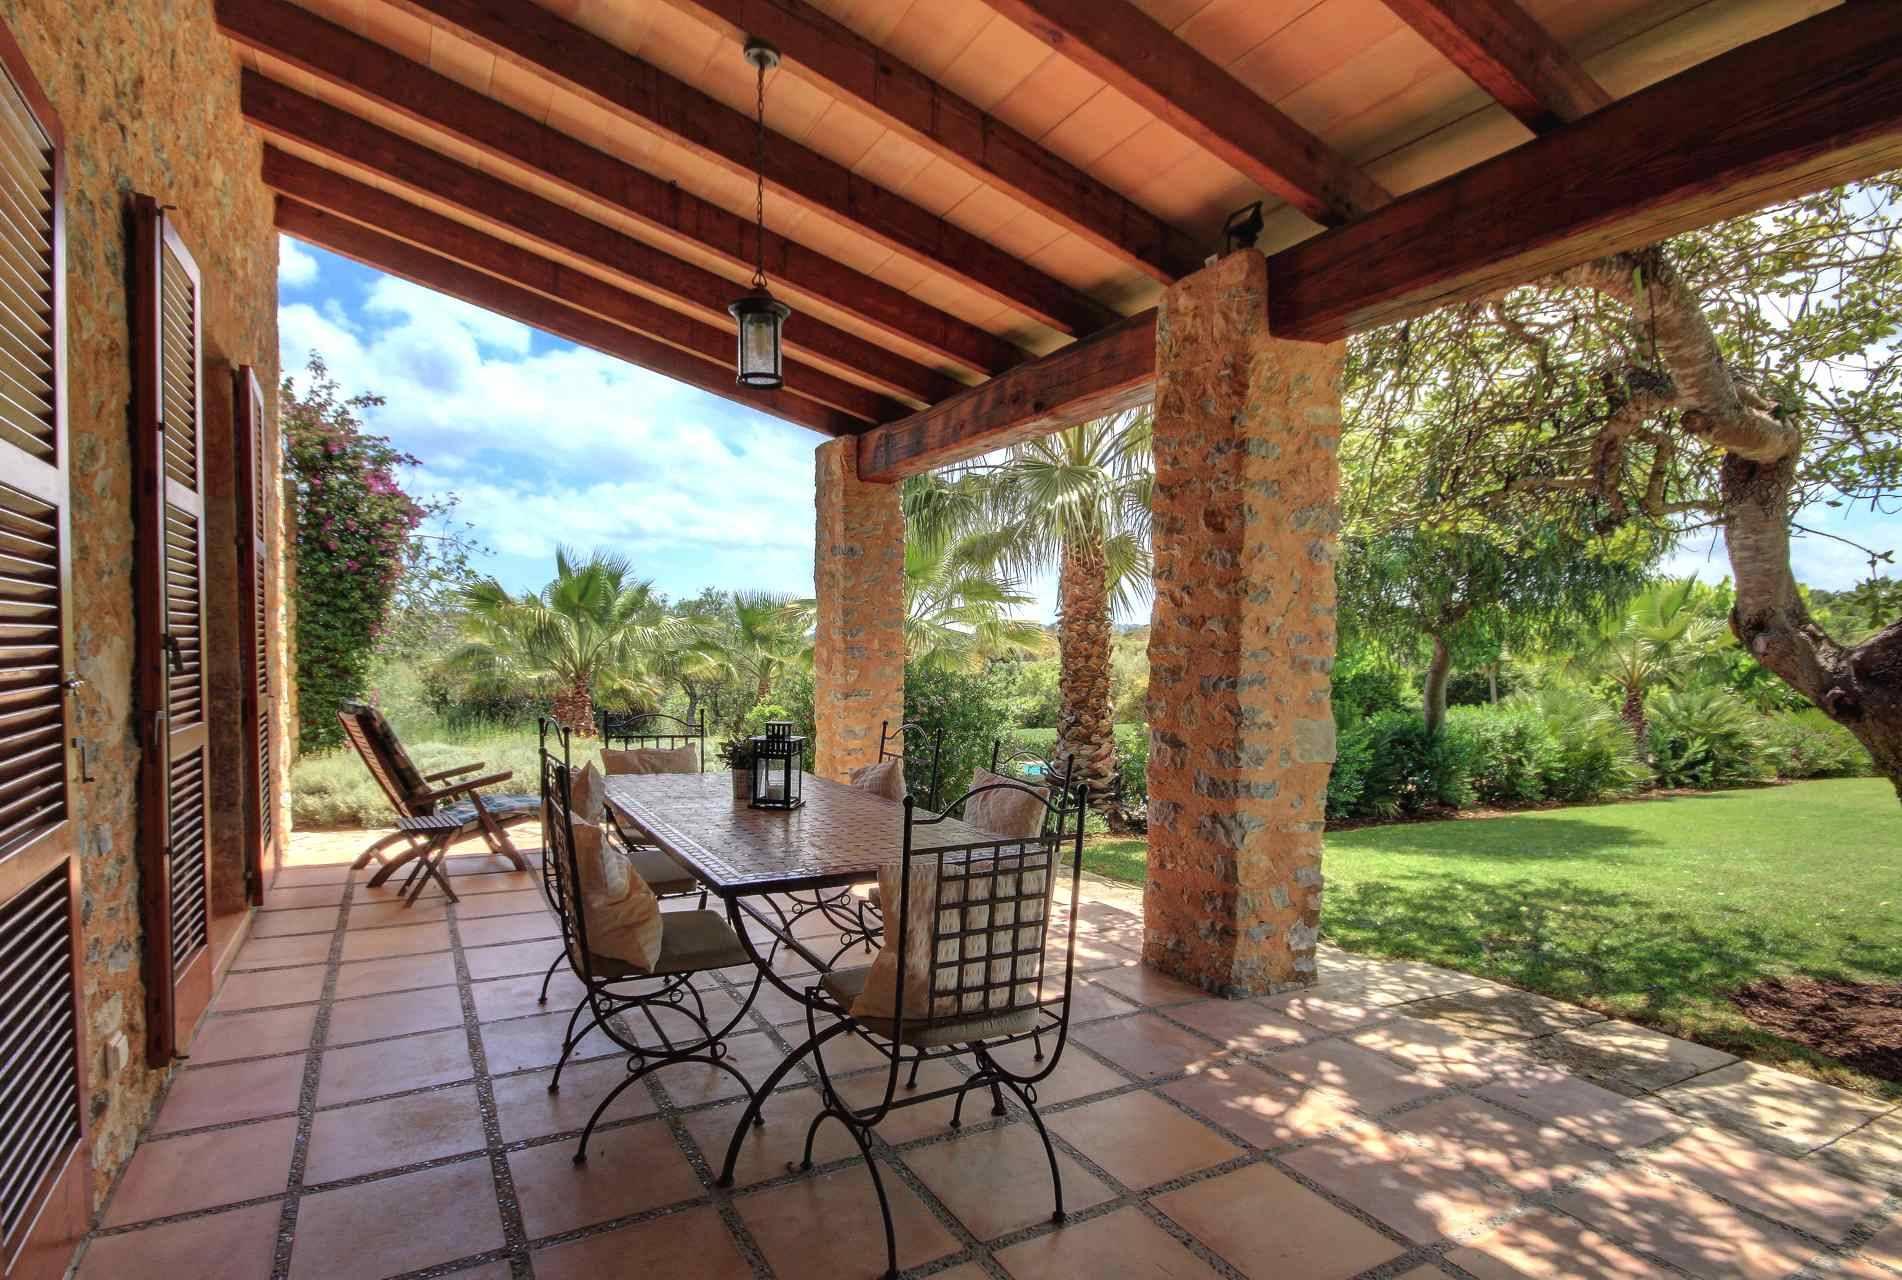 01-51 Authentic Finca Mallorca Northeast Bild 11